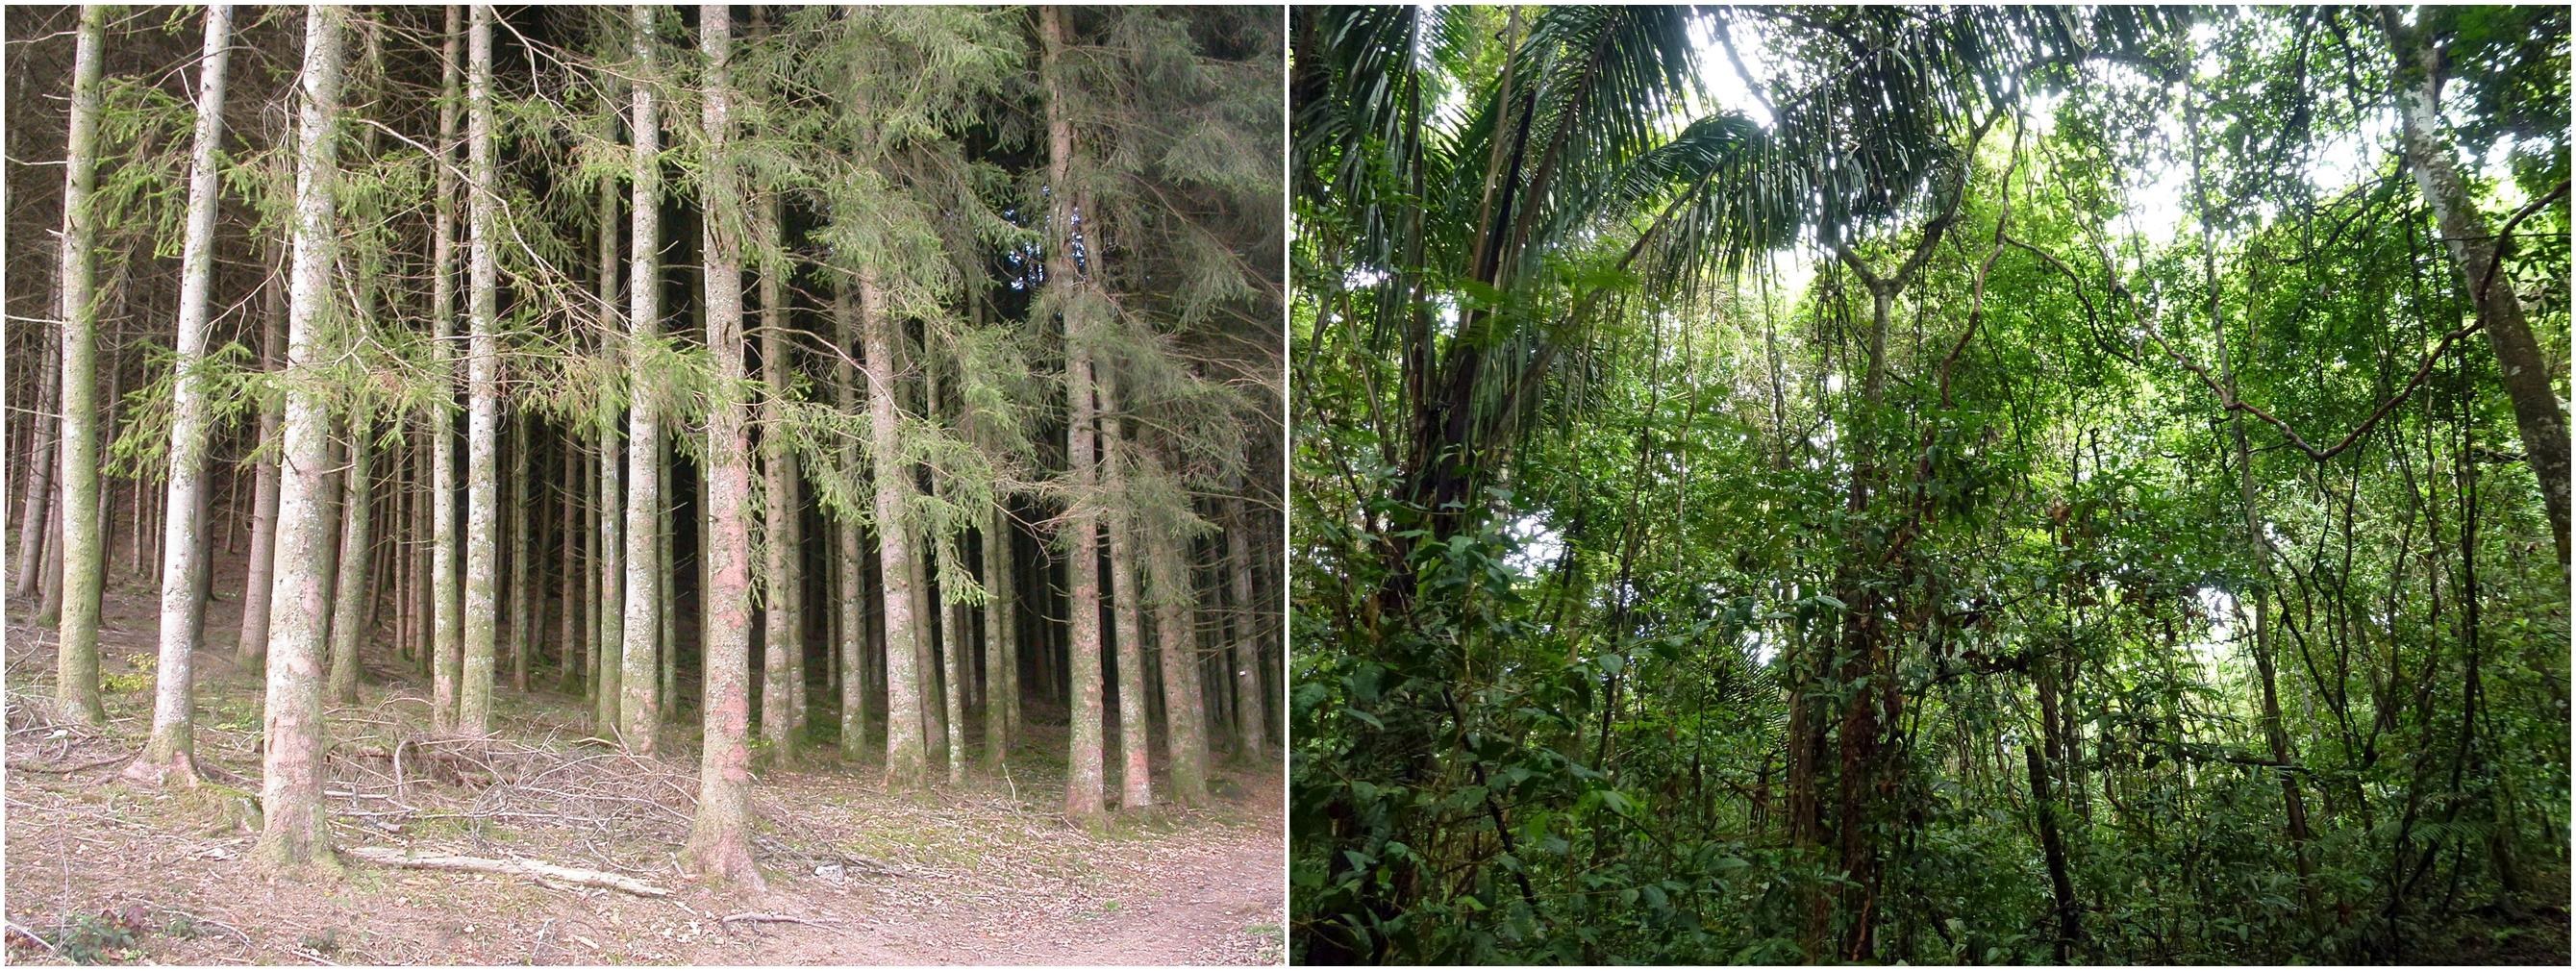 Fichtenmonokultur vs. artenreicher Mischwald